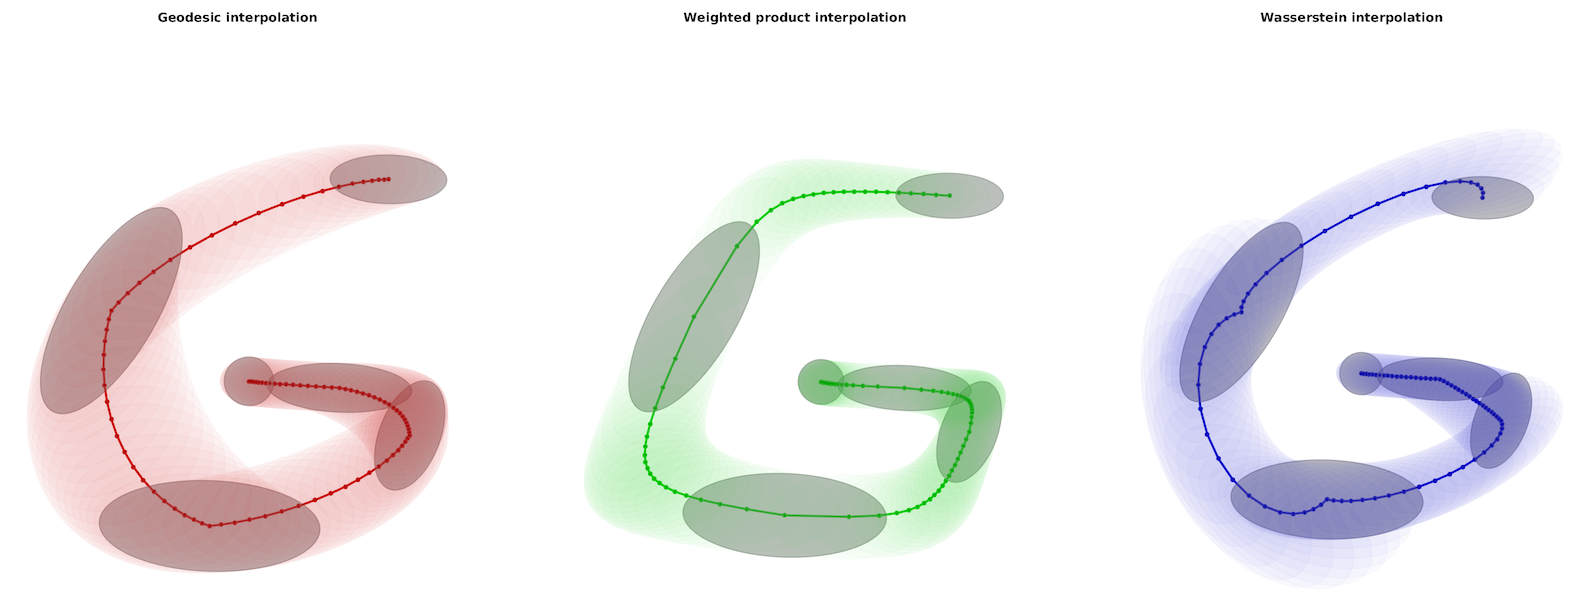 images/demo_Riemannian_cov_interp02.png